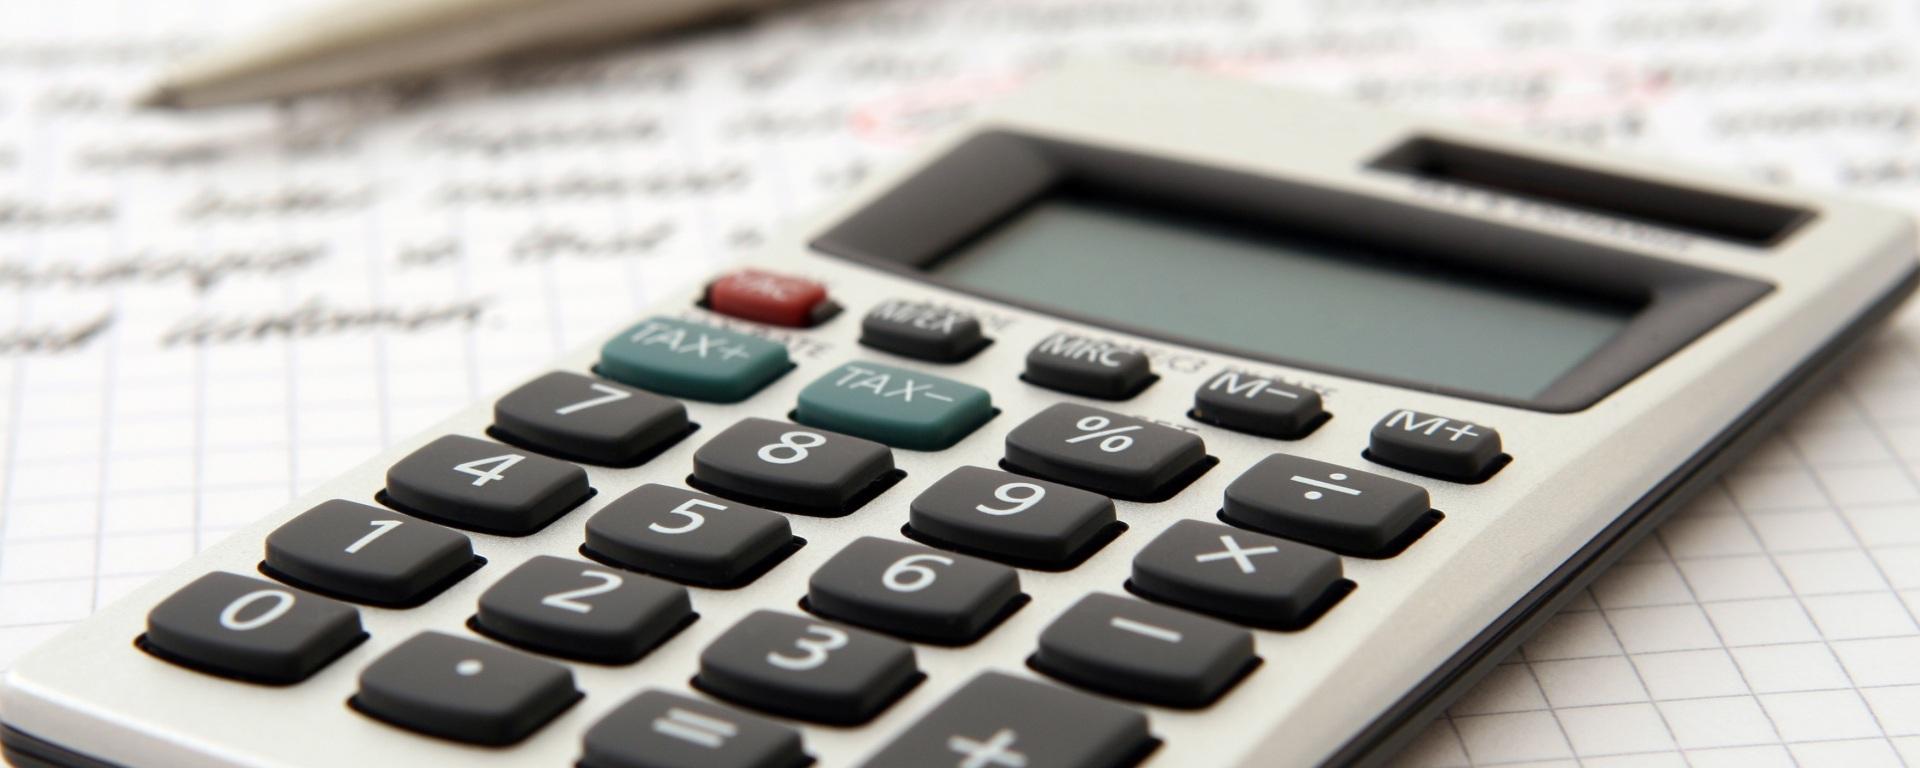 10-key pad calculator